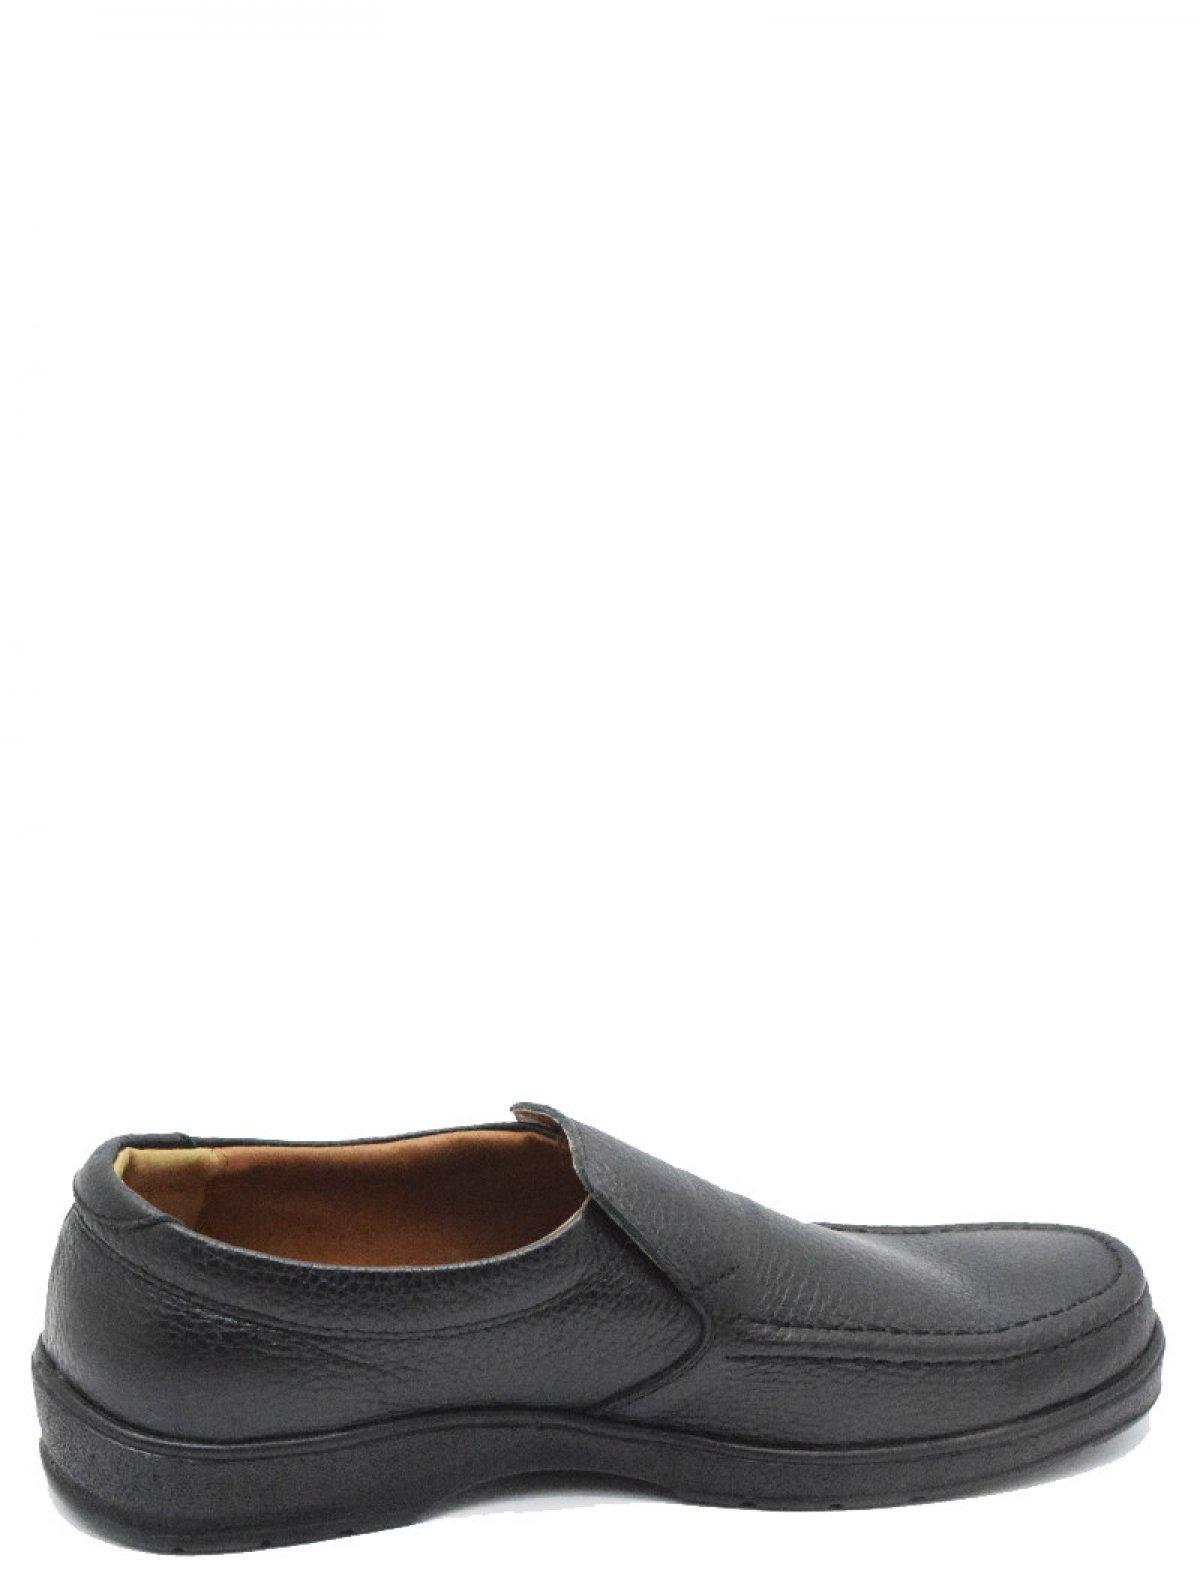 Baratto 2-305-101-1 мужские туфли